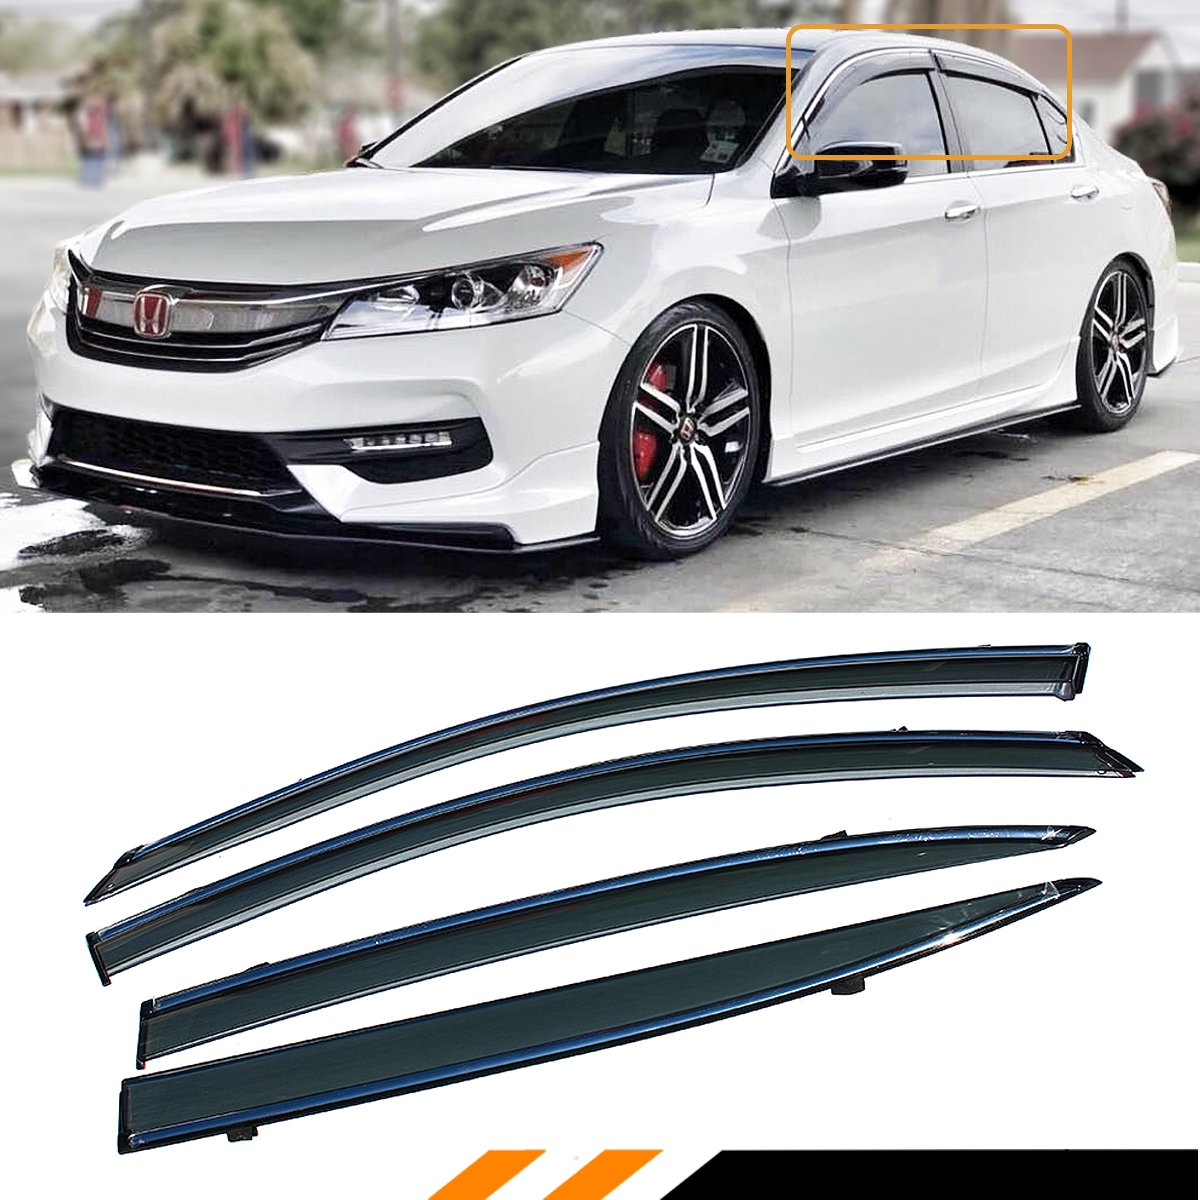 4Pcs Window Visor Vent Shade Rain//Sun//Wind Guard for 2013-2015 Up Honda Accord